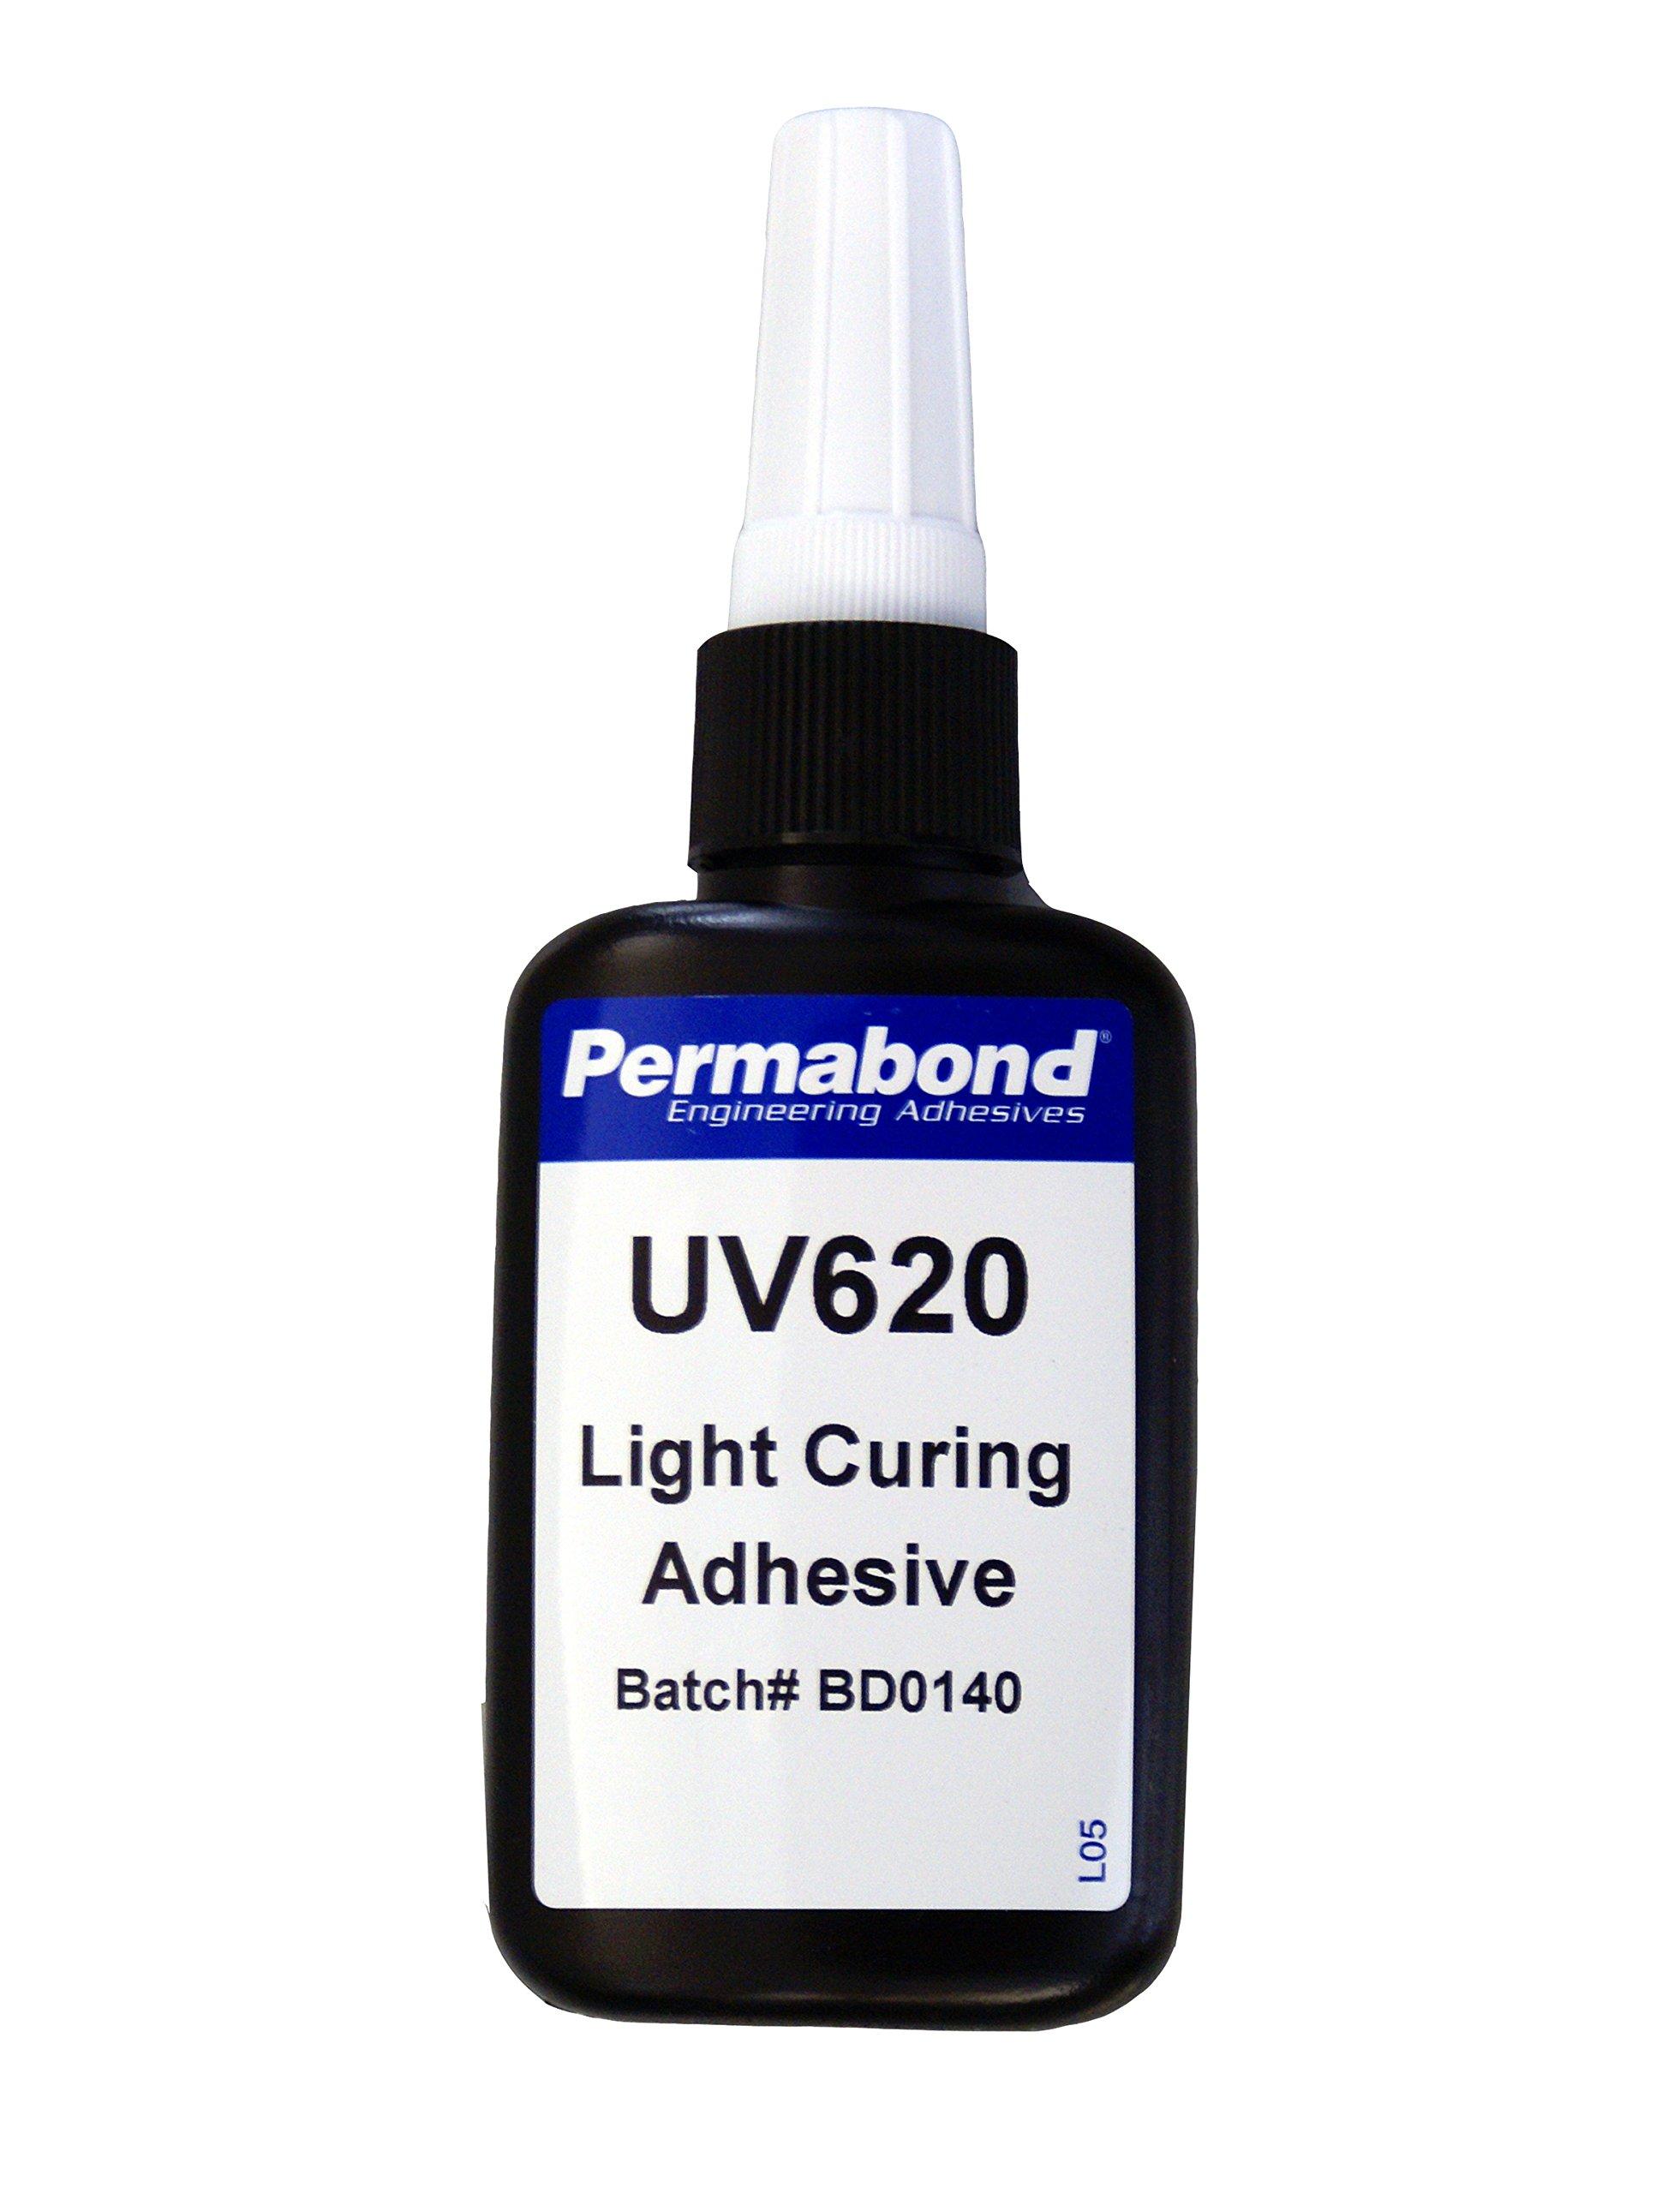 Permabond UV620 UV Cured Adhesive, 50 mL